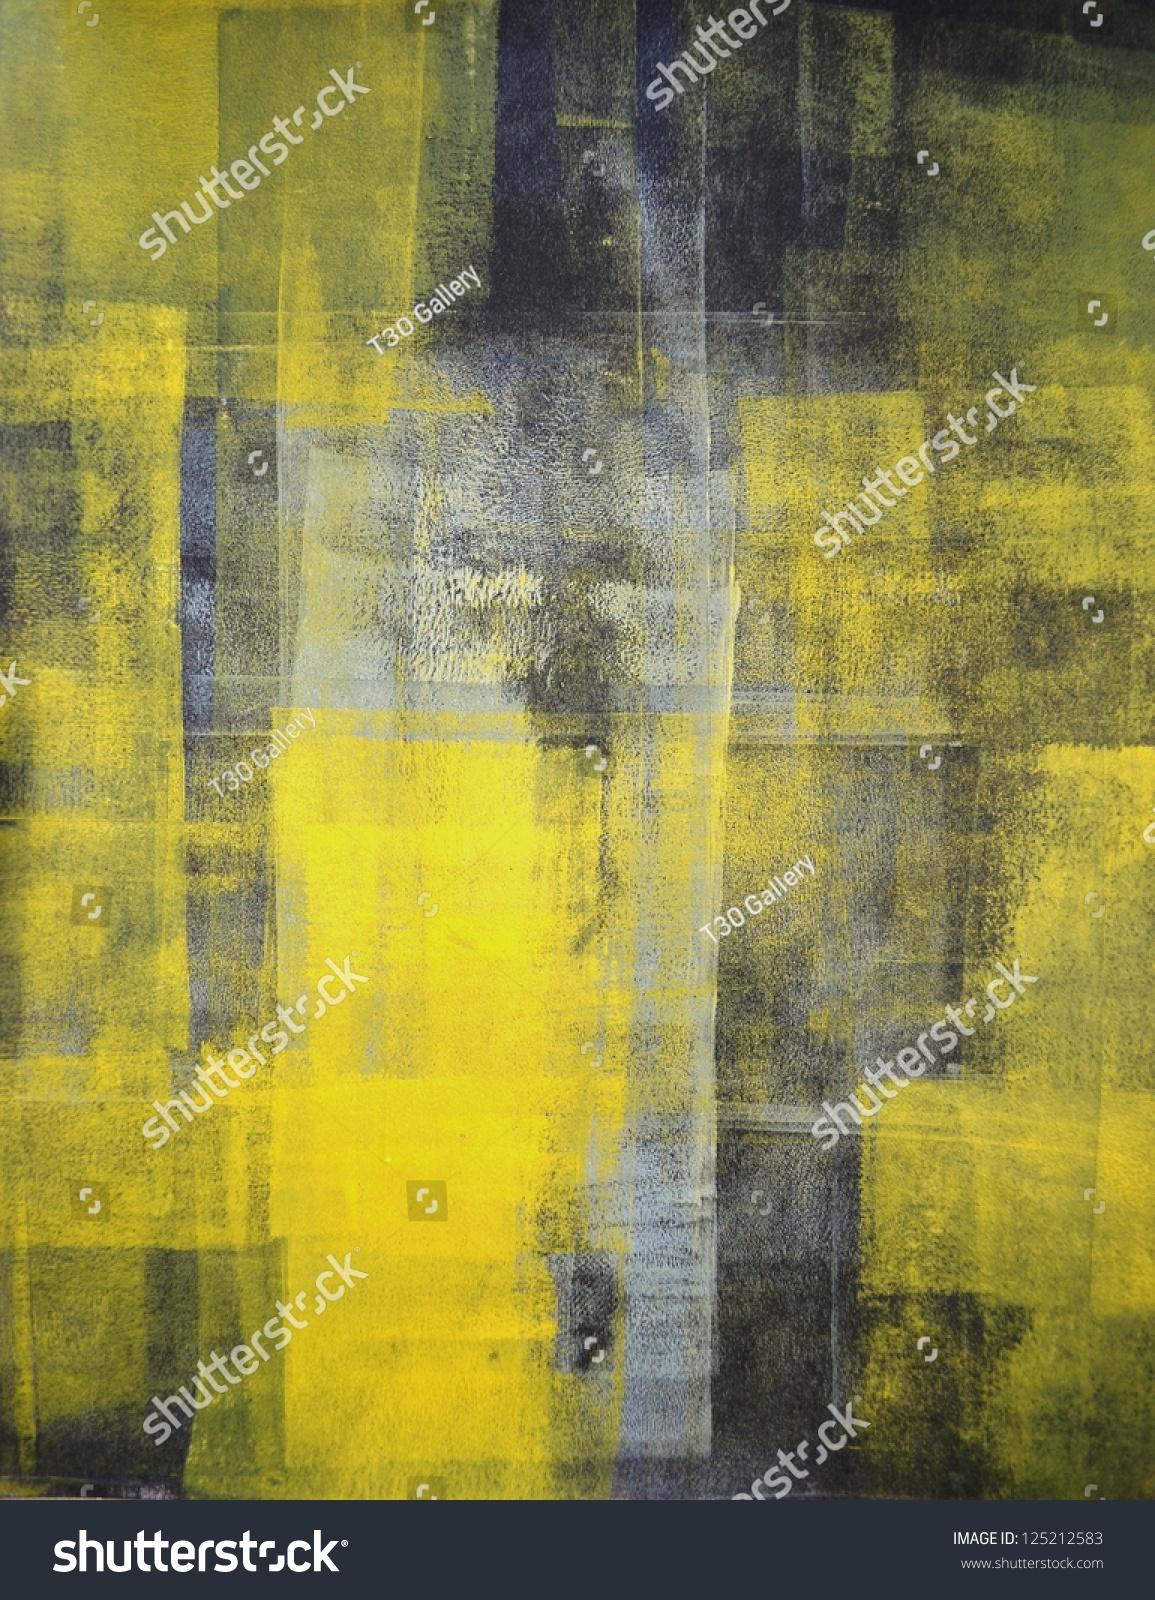 Black Yellow Abstract Art Painting Stock Photo 125212583 ... Yellow Black Abstract Paintings